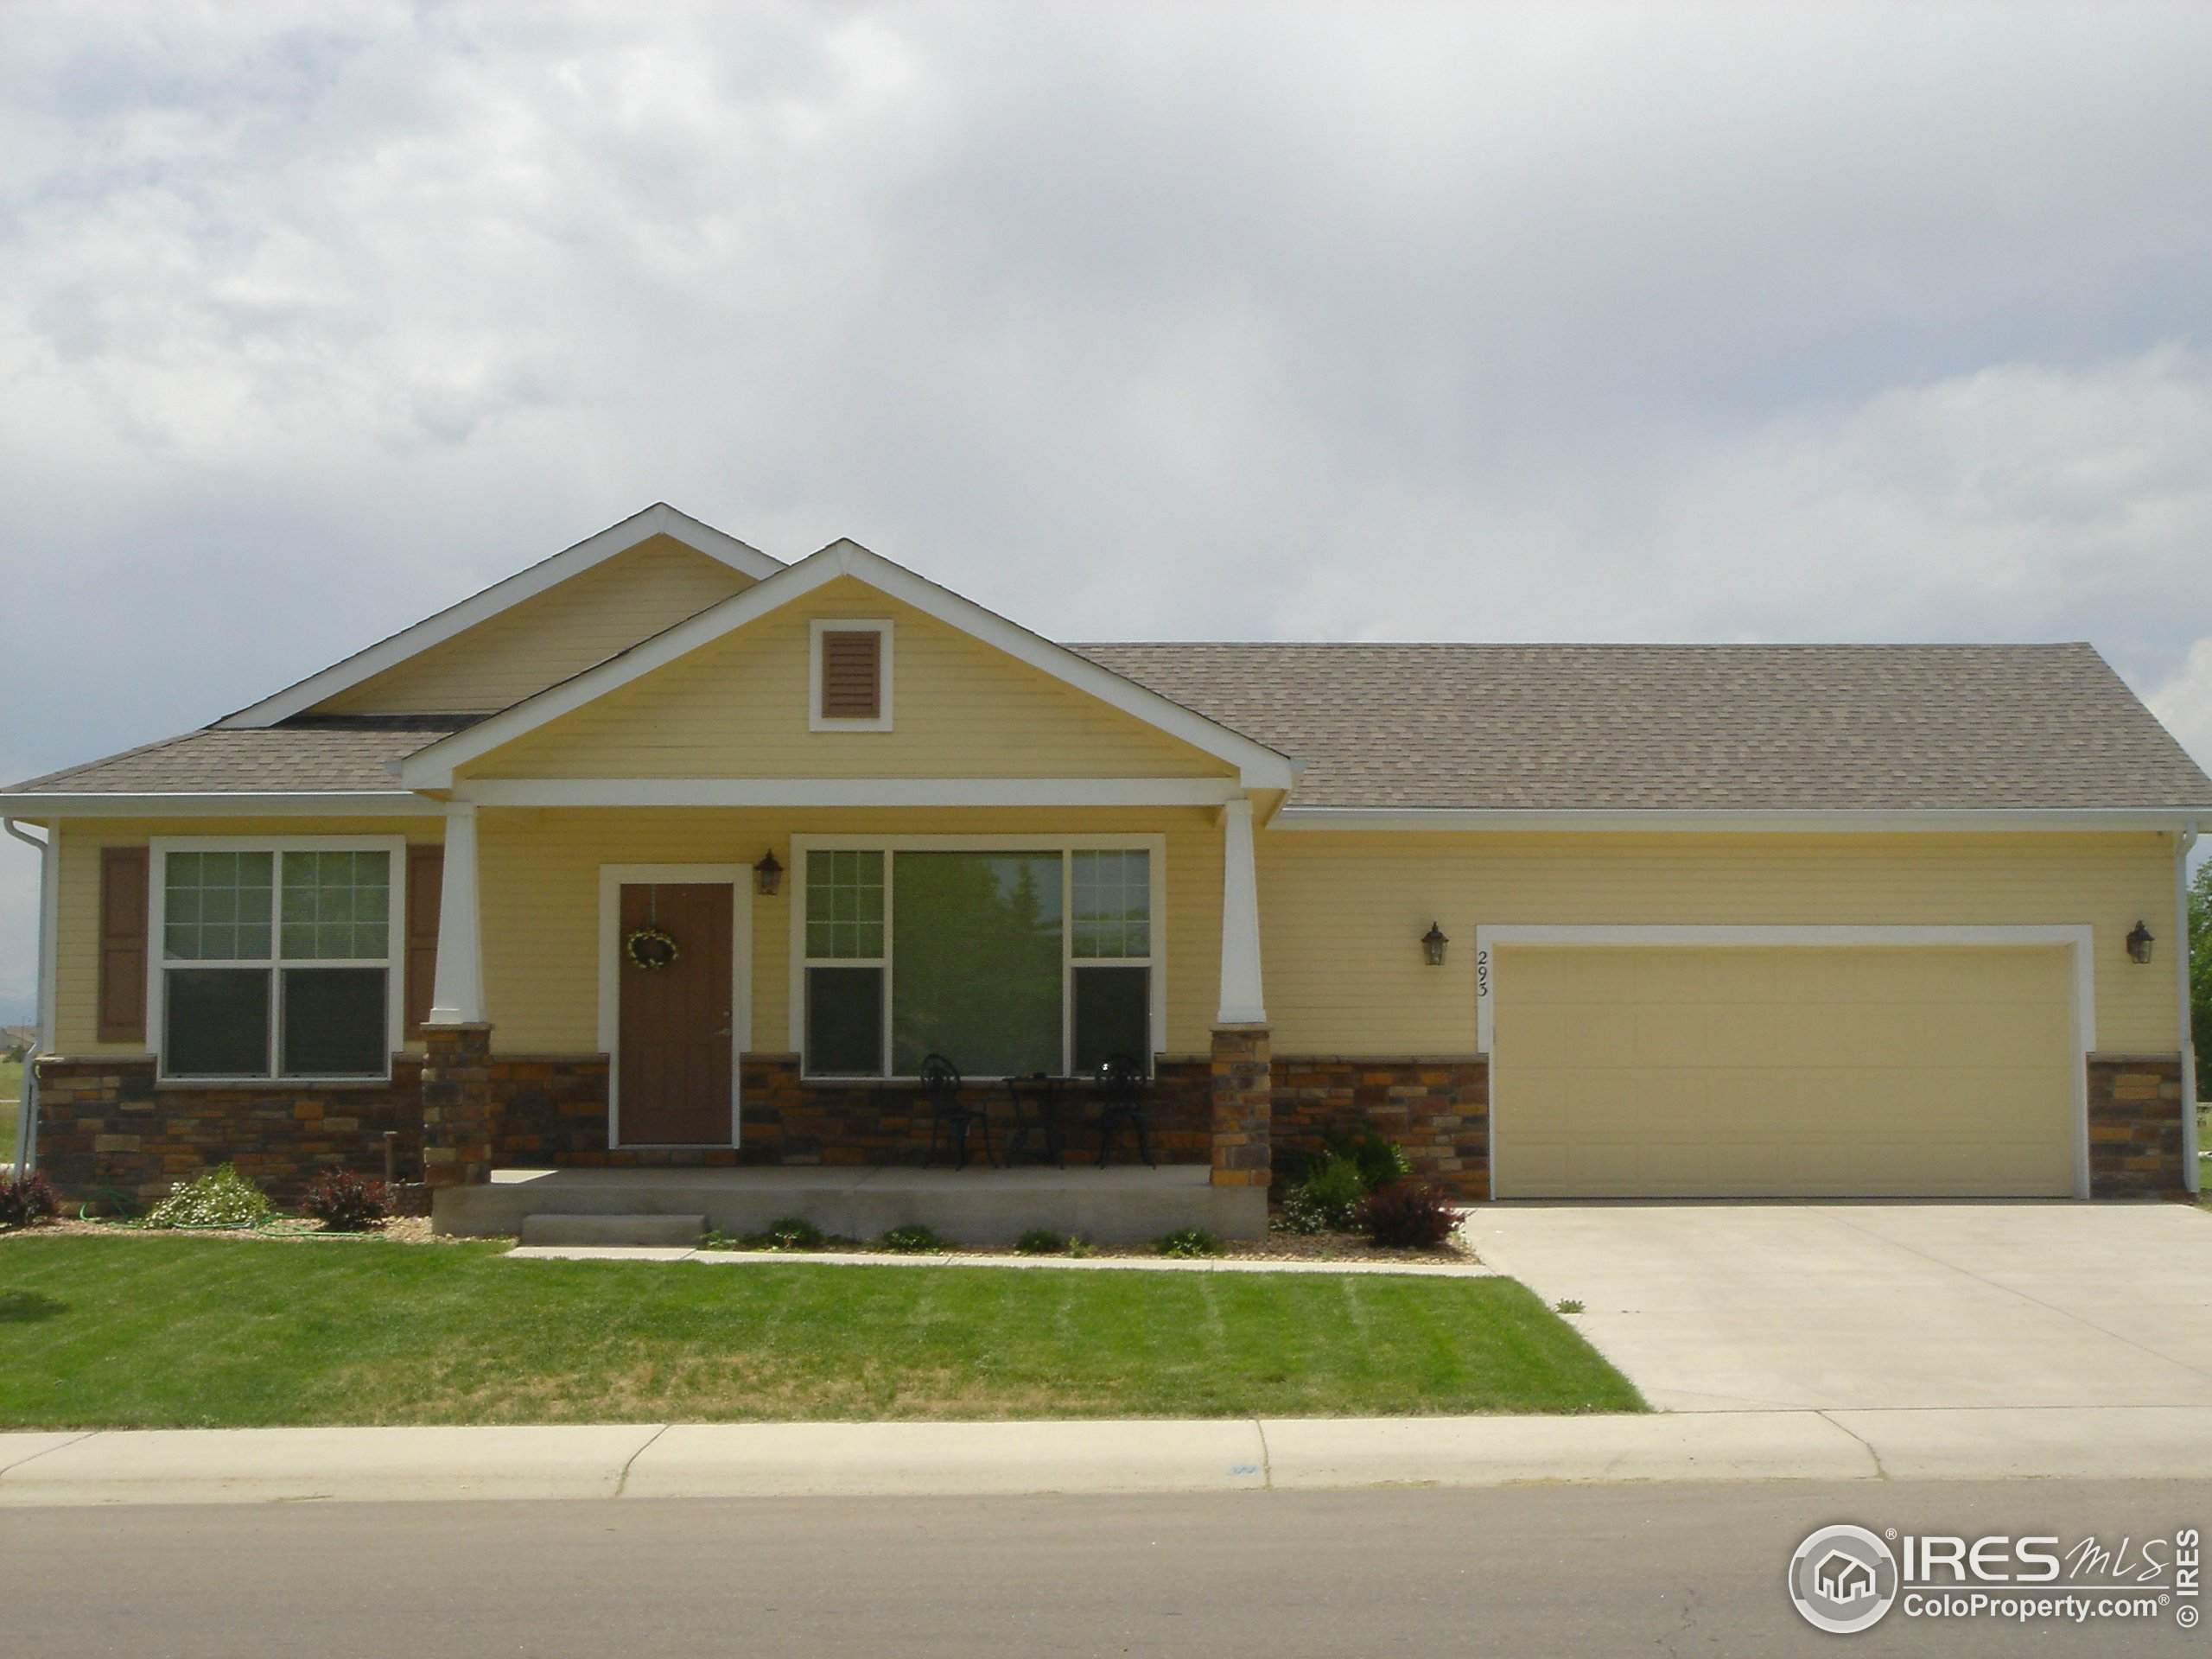 118 Wenatchee St, Lochbuie, CO 80603 (MLS #931694) :: Colorado Home Finder Realty